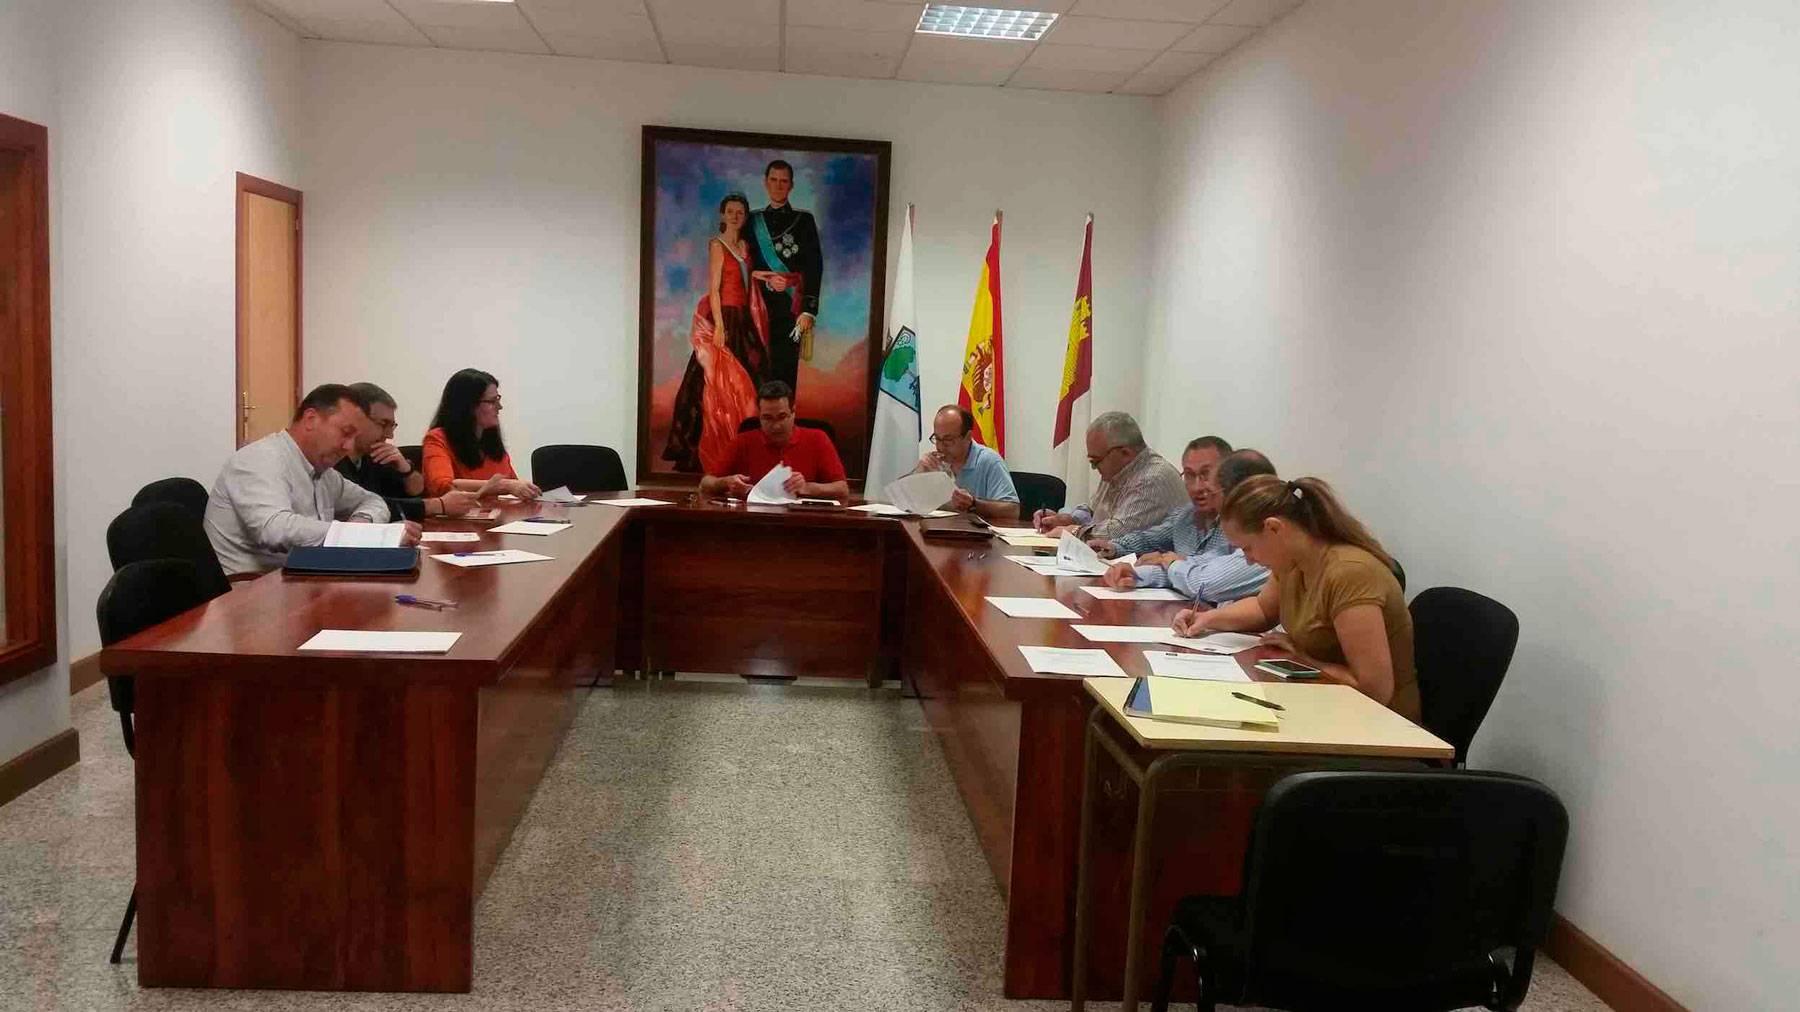 reunion-de-junta-directiva-mancha-norte-desarrollo-e-innovacion-promancha